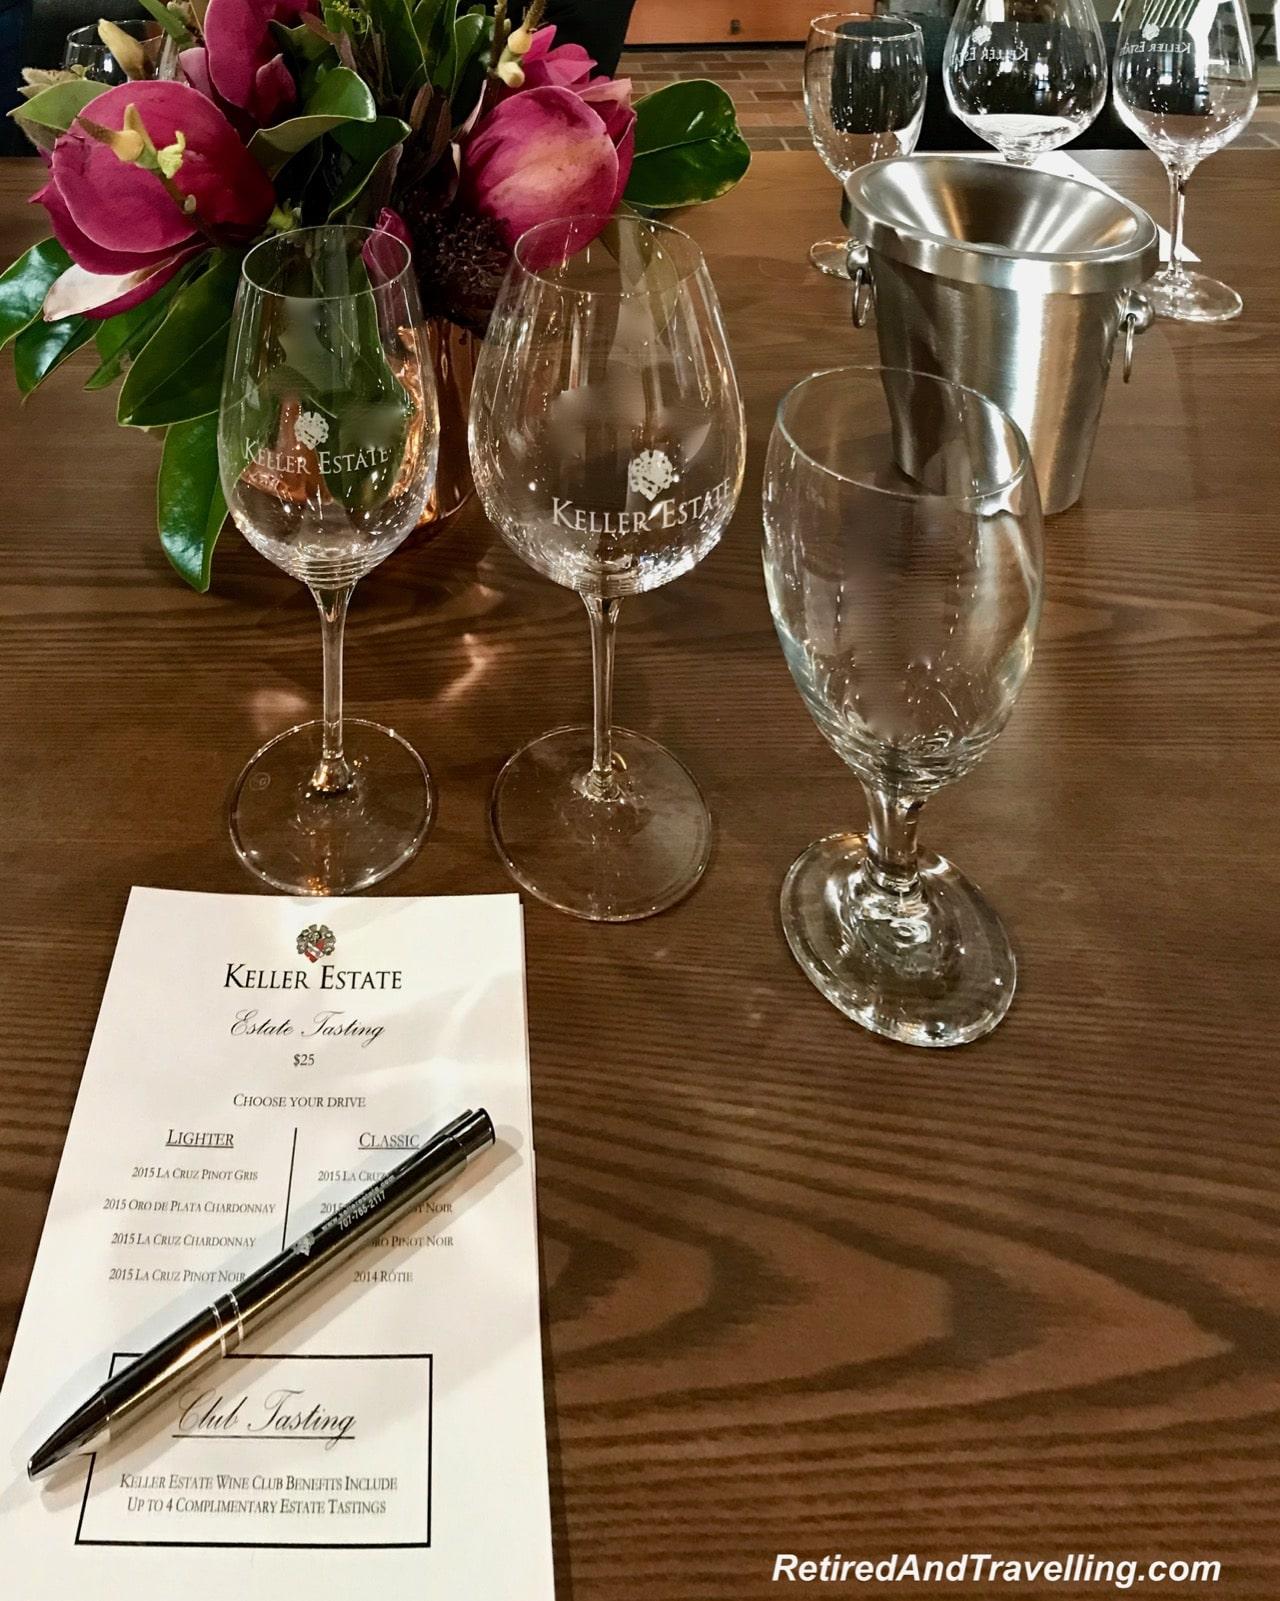 Tasting Menu Keller Estates - Wine Tasting Experience In Napa.jpg